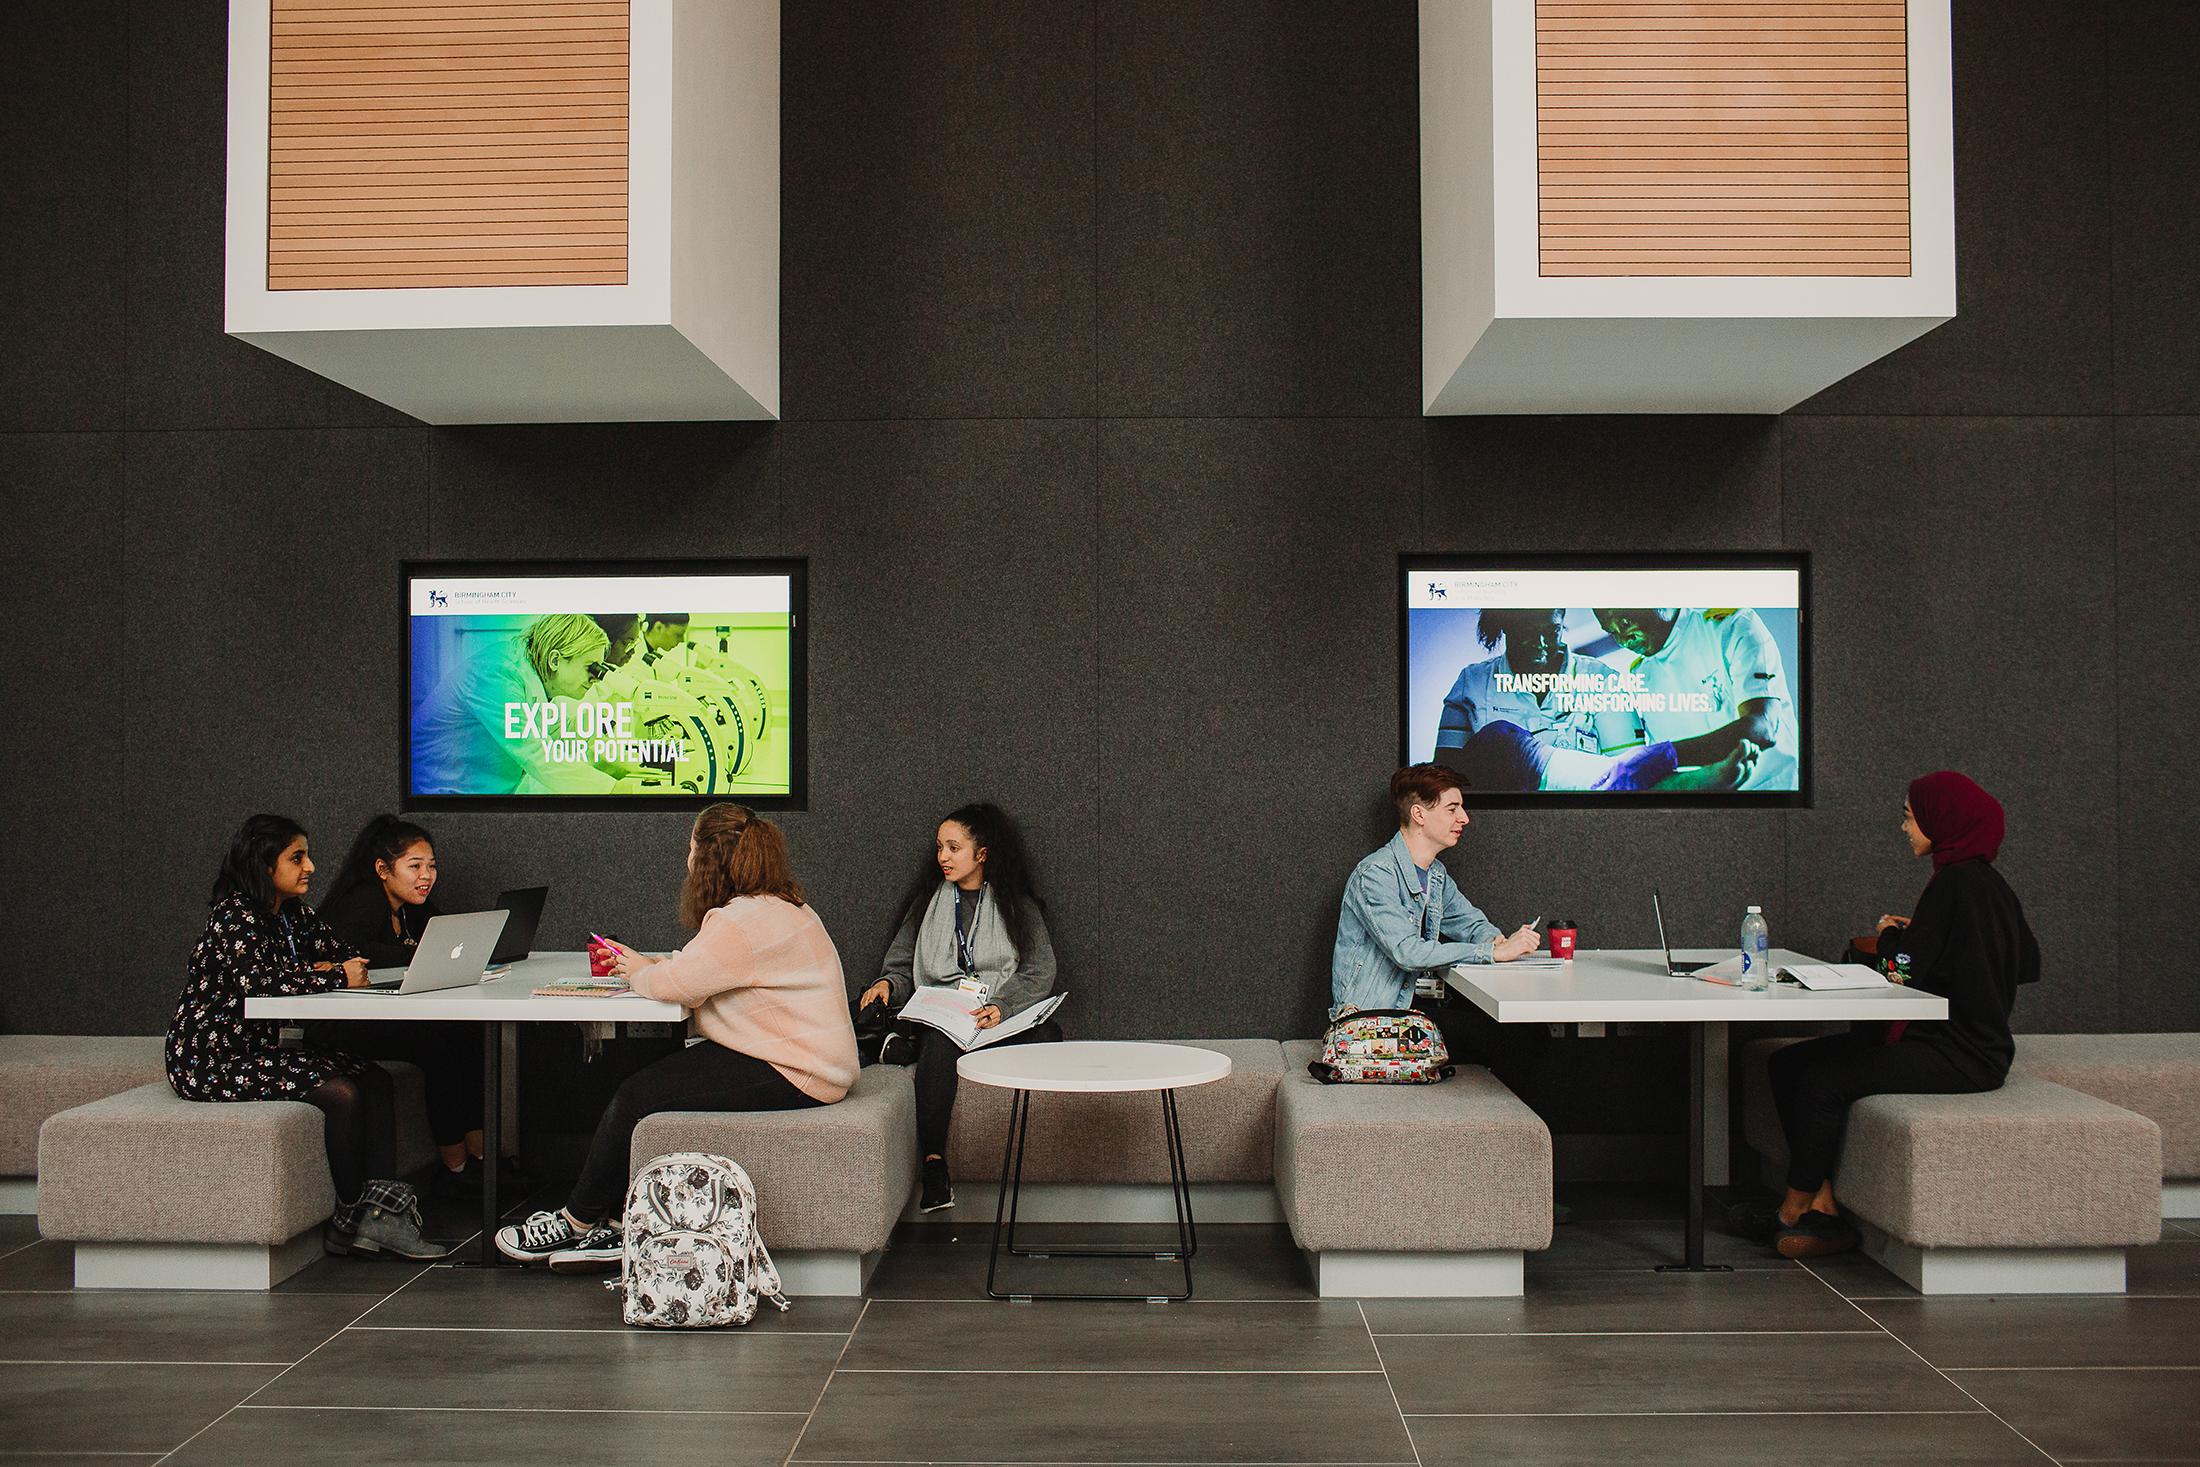 Seacole atrium study space